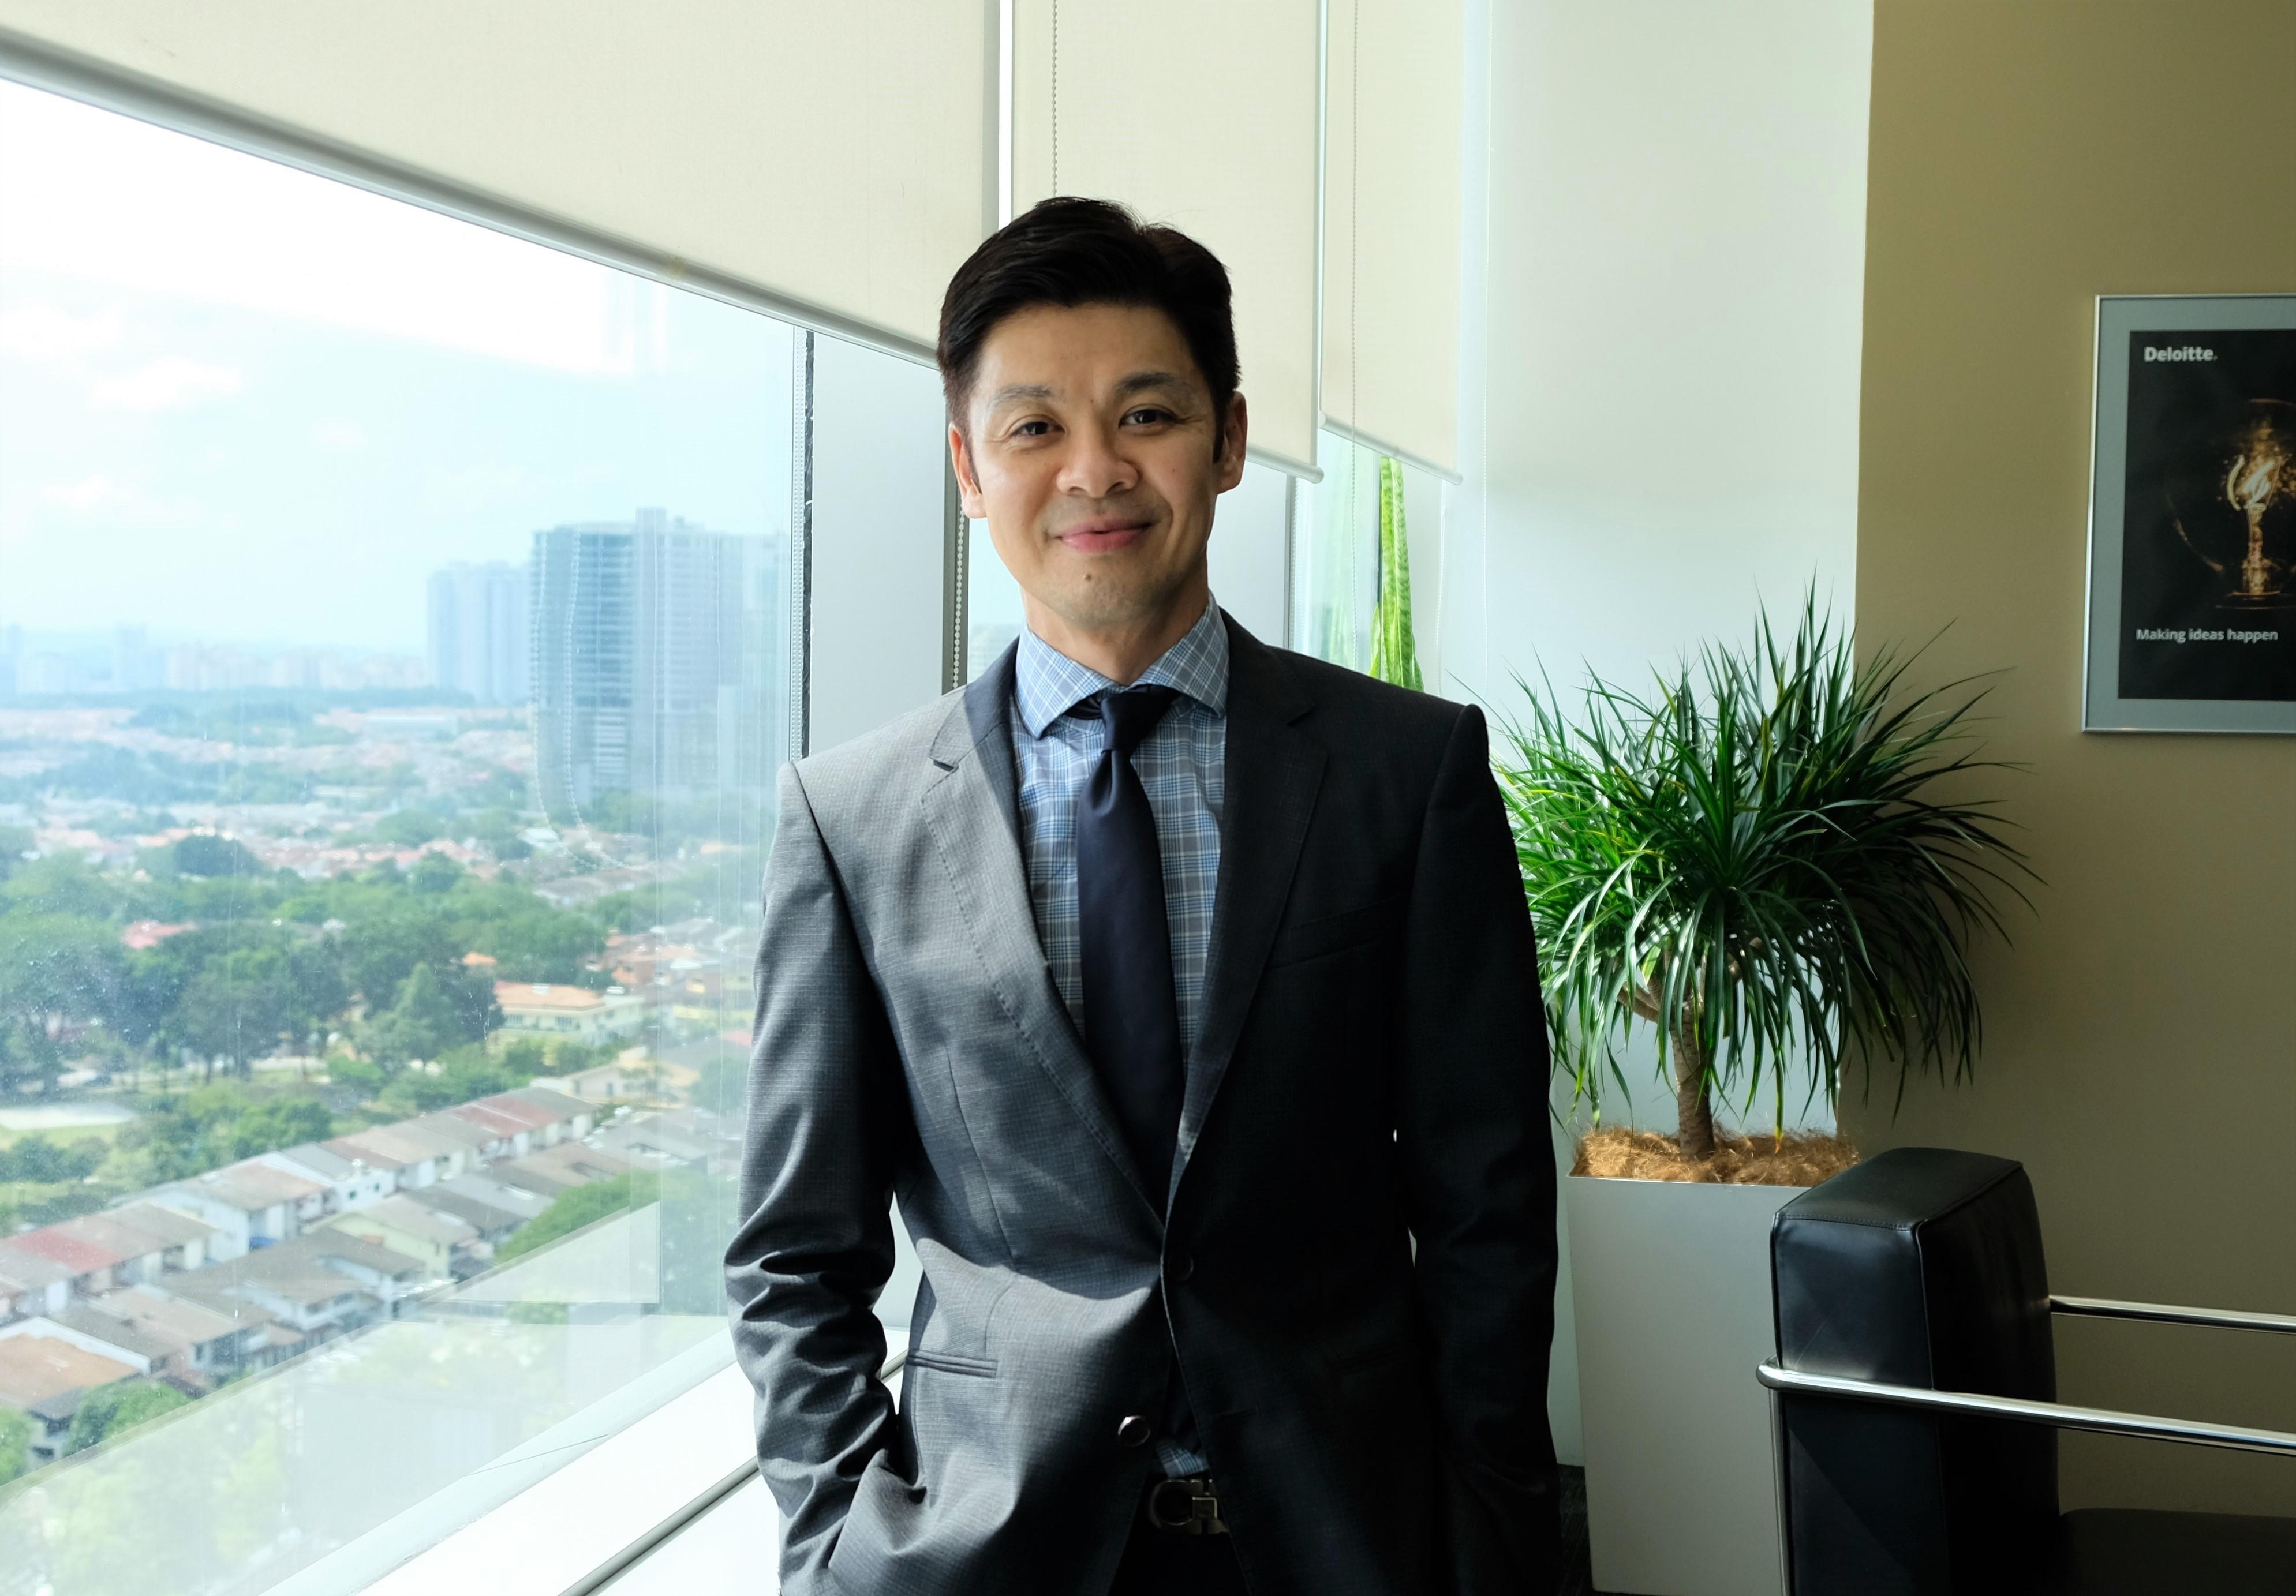 CPA Australia: Malaysian small businesses increase use of digital technologies due to COVID